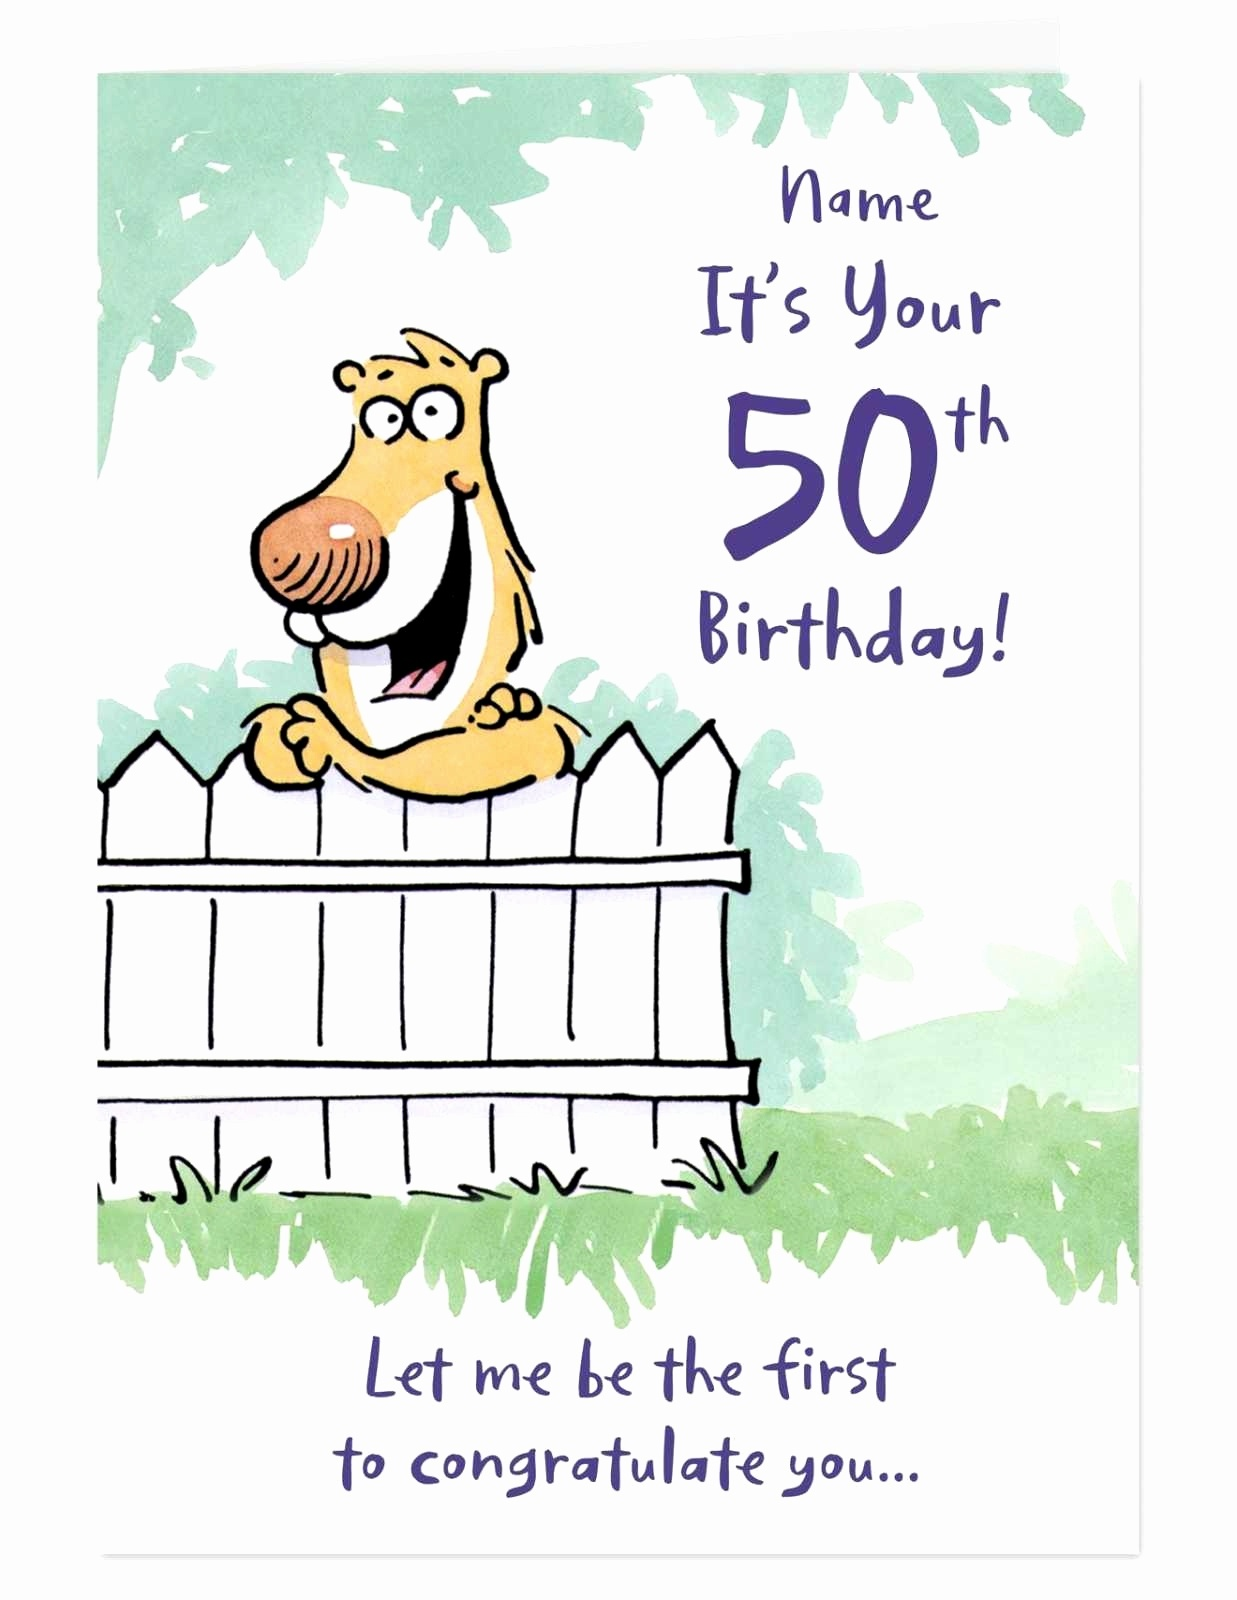 93+ Free Birthday Ecards For Boss - Birthday Cards For My Boss - Boss Day Cards Free Printable